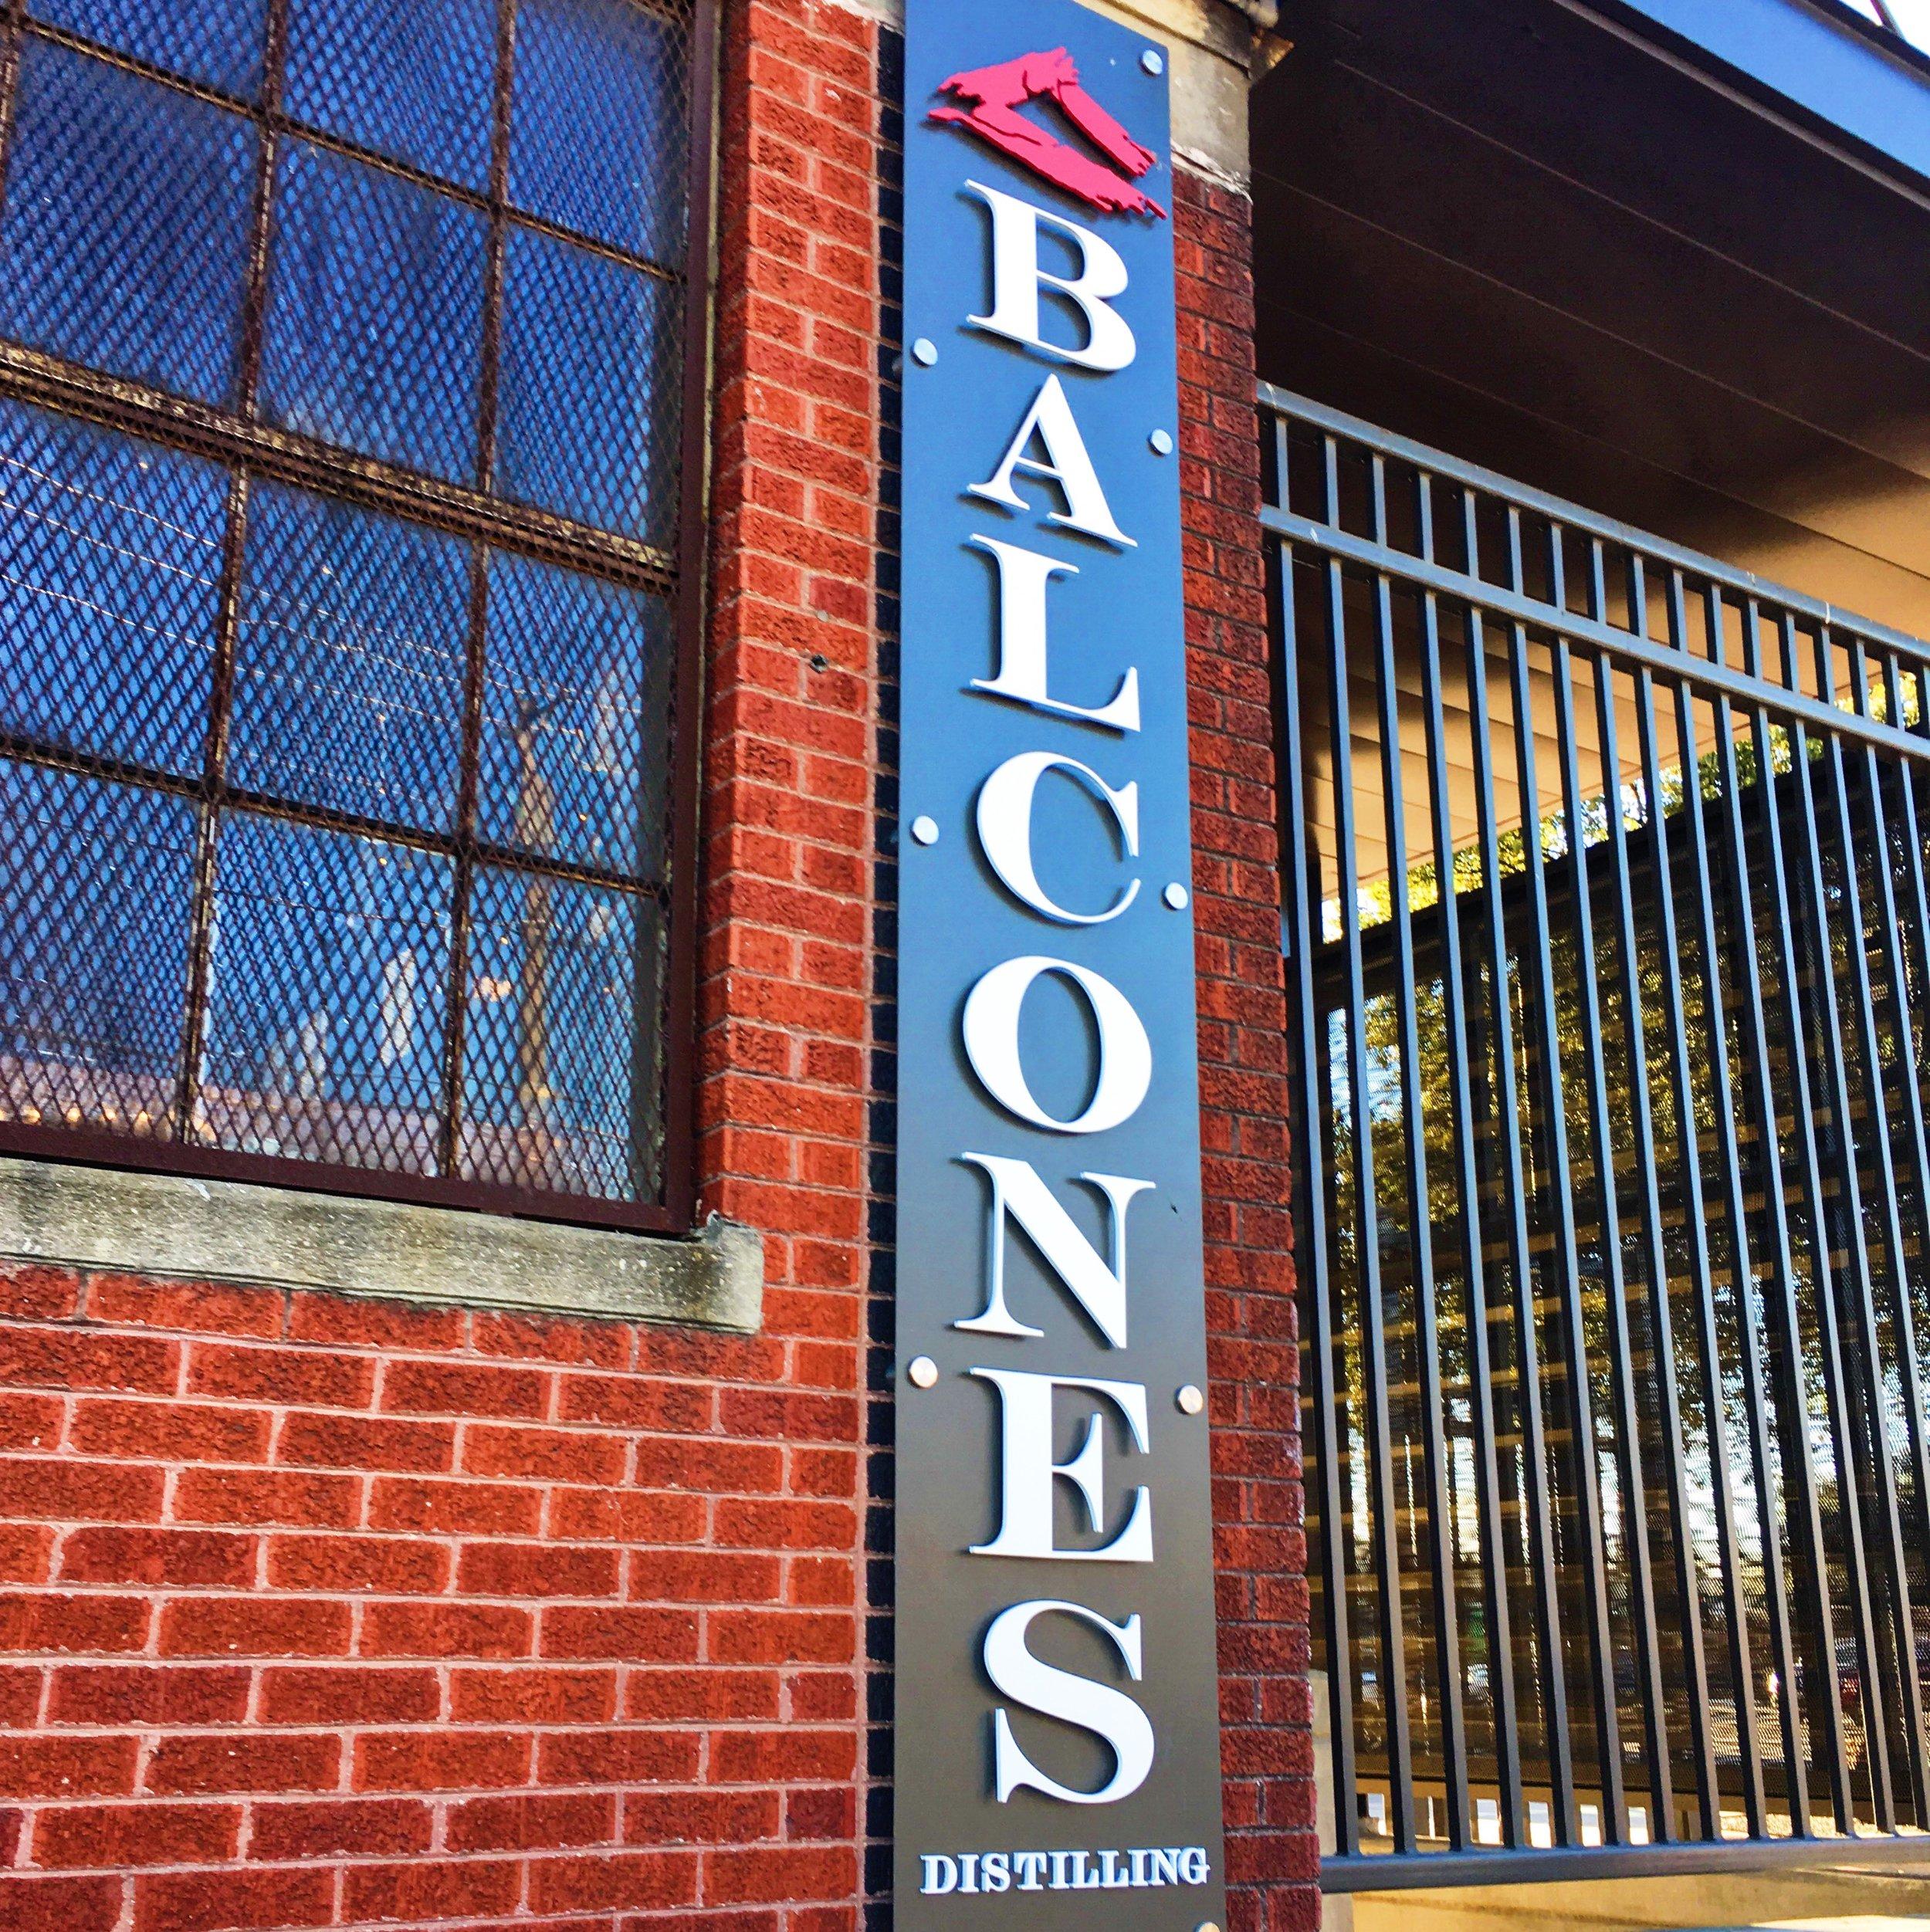 Balcones Whiskey - Things to do in Waco - Wander Dust Blog  (2).JPG